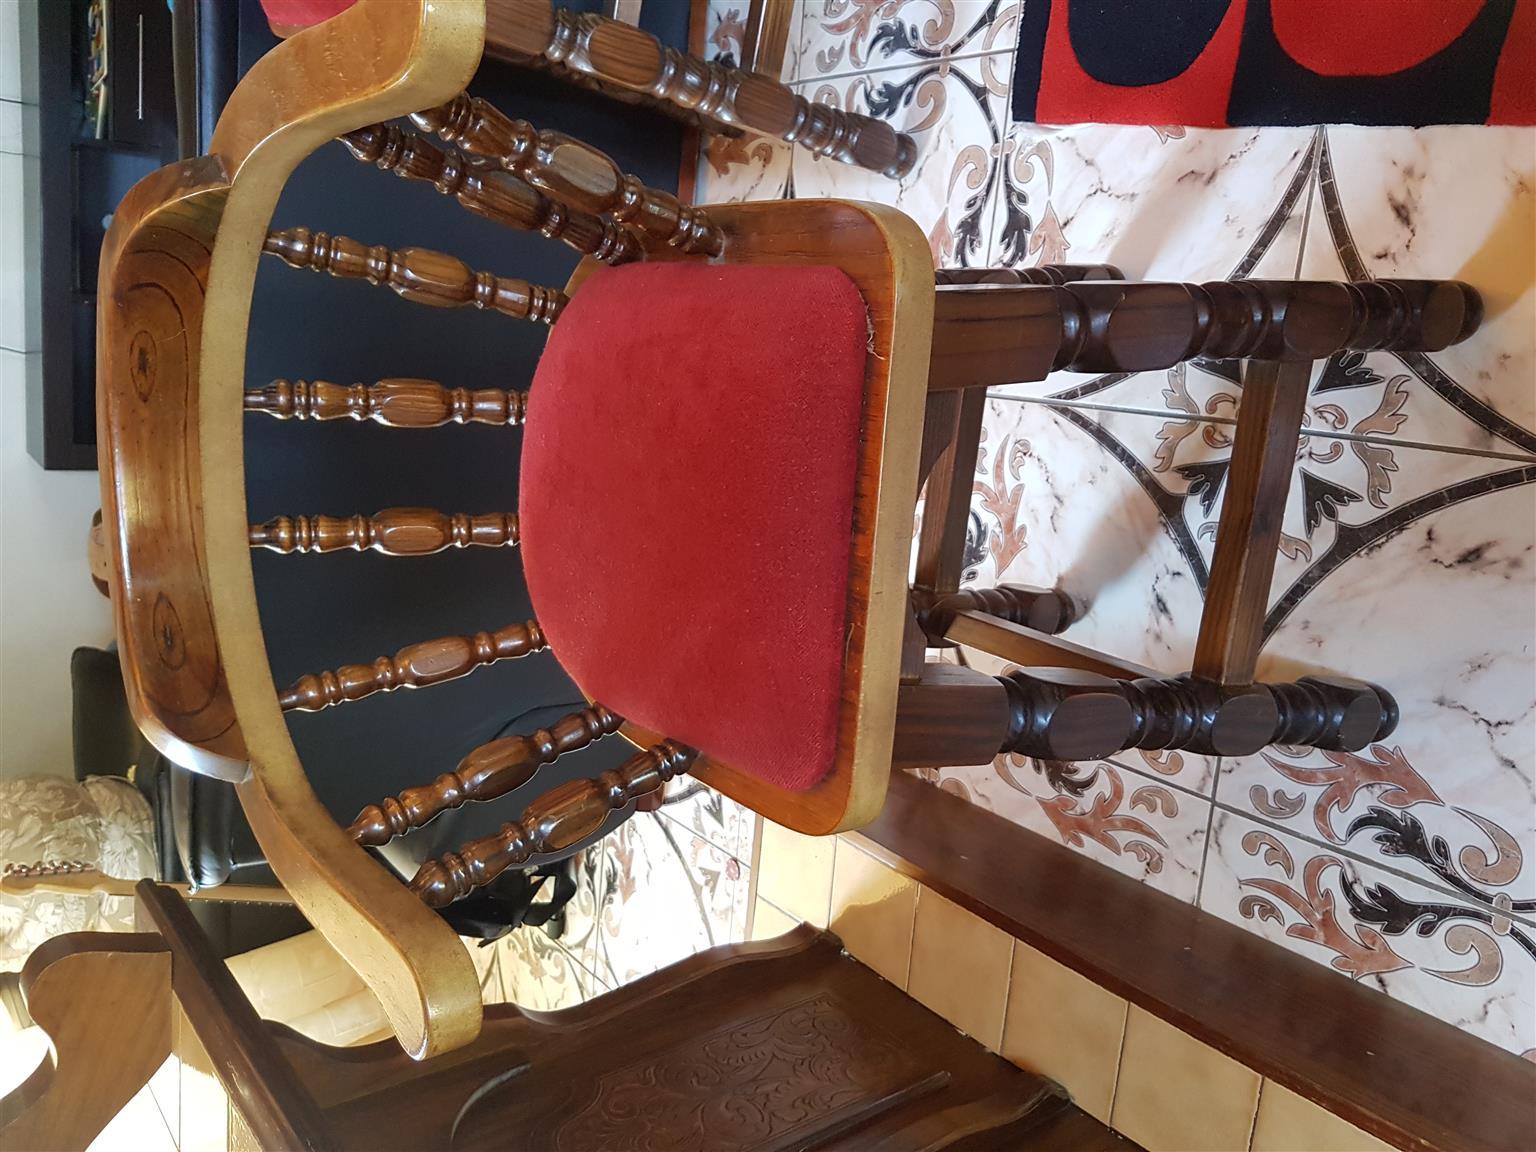 Solid Wood Bar with bar stools